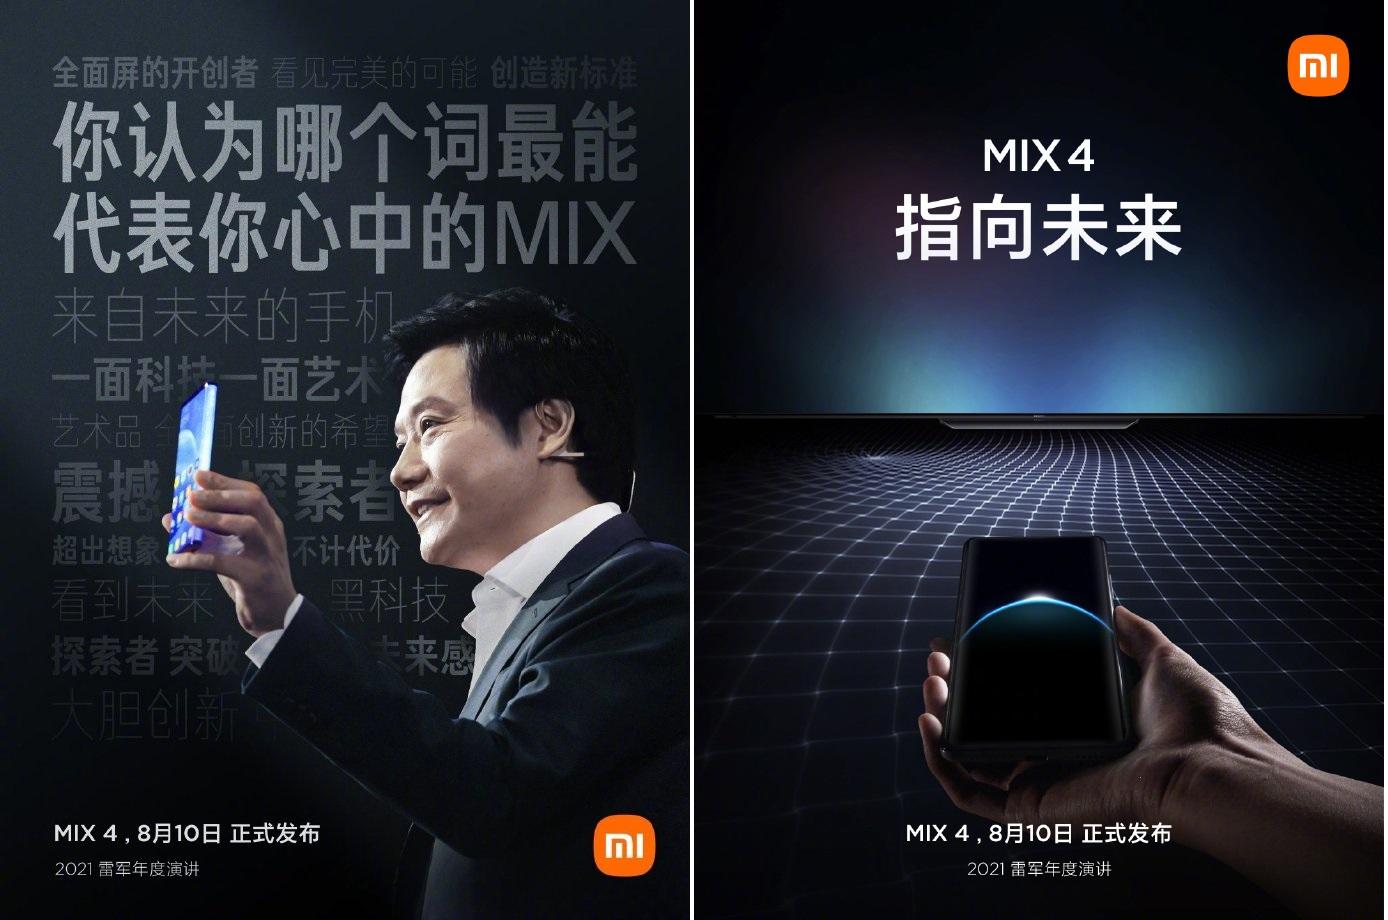 Xiaomi Mi Mix 4 flagship smartphone introduced